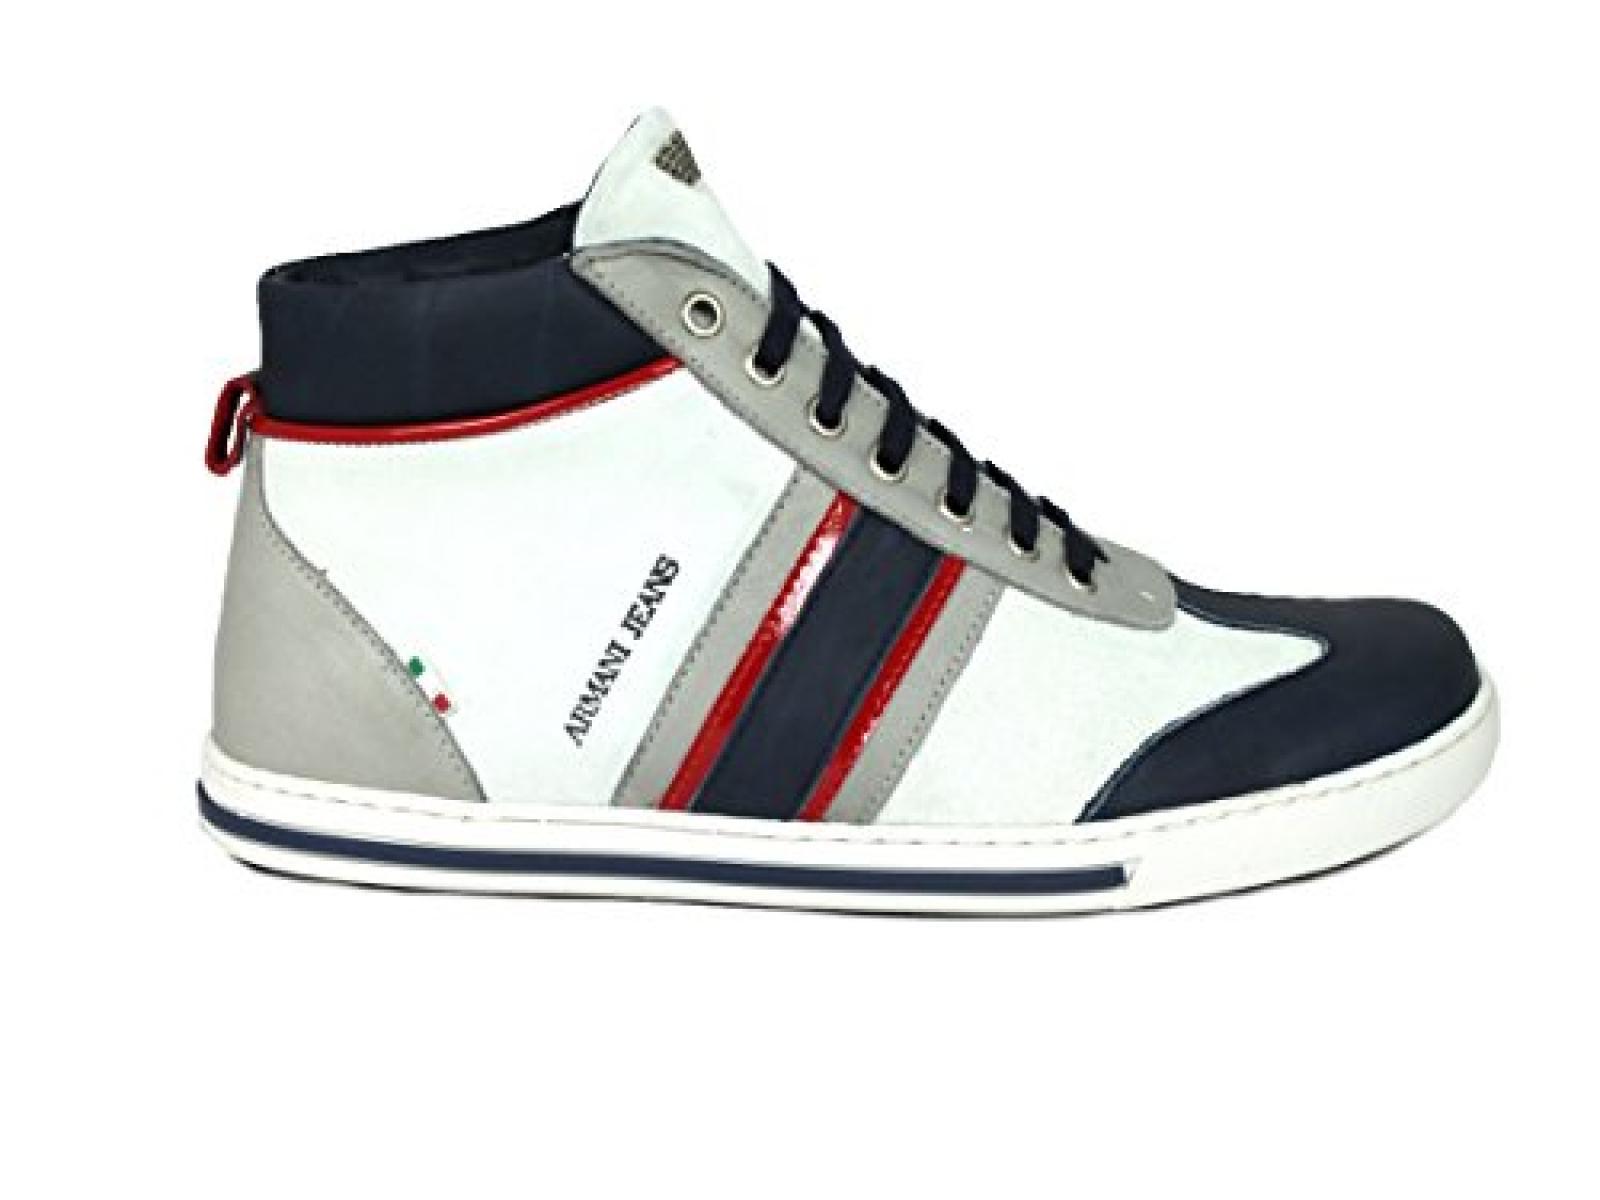 Armani Herrenschuhe Shoe Sneaker Jeans gefüttert Schuhe bfgvYy76